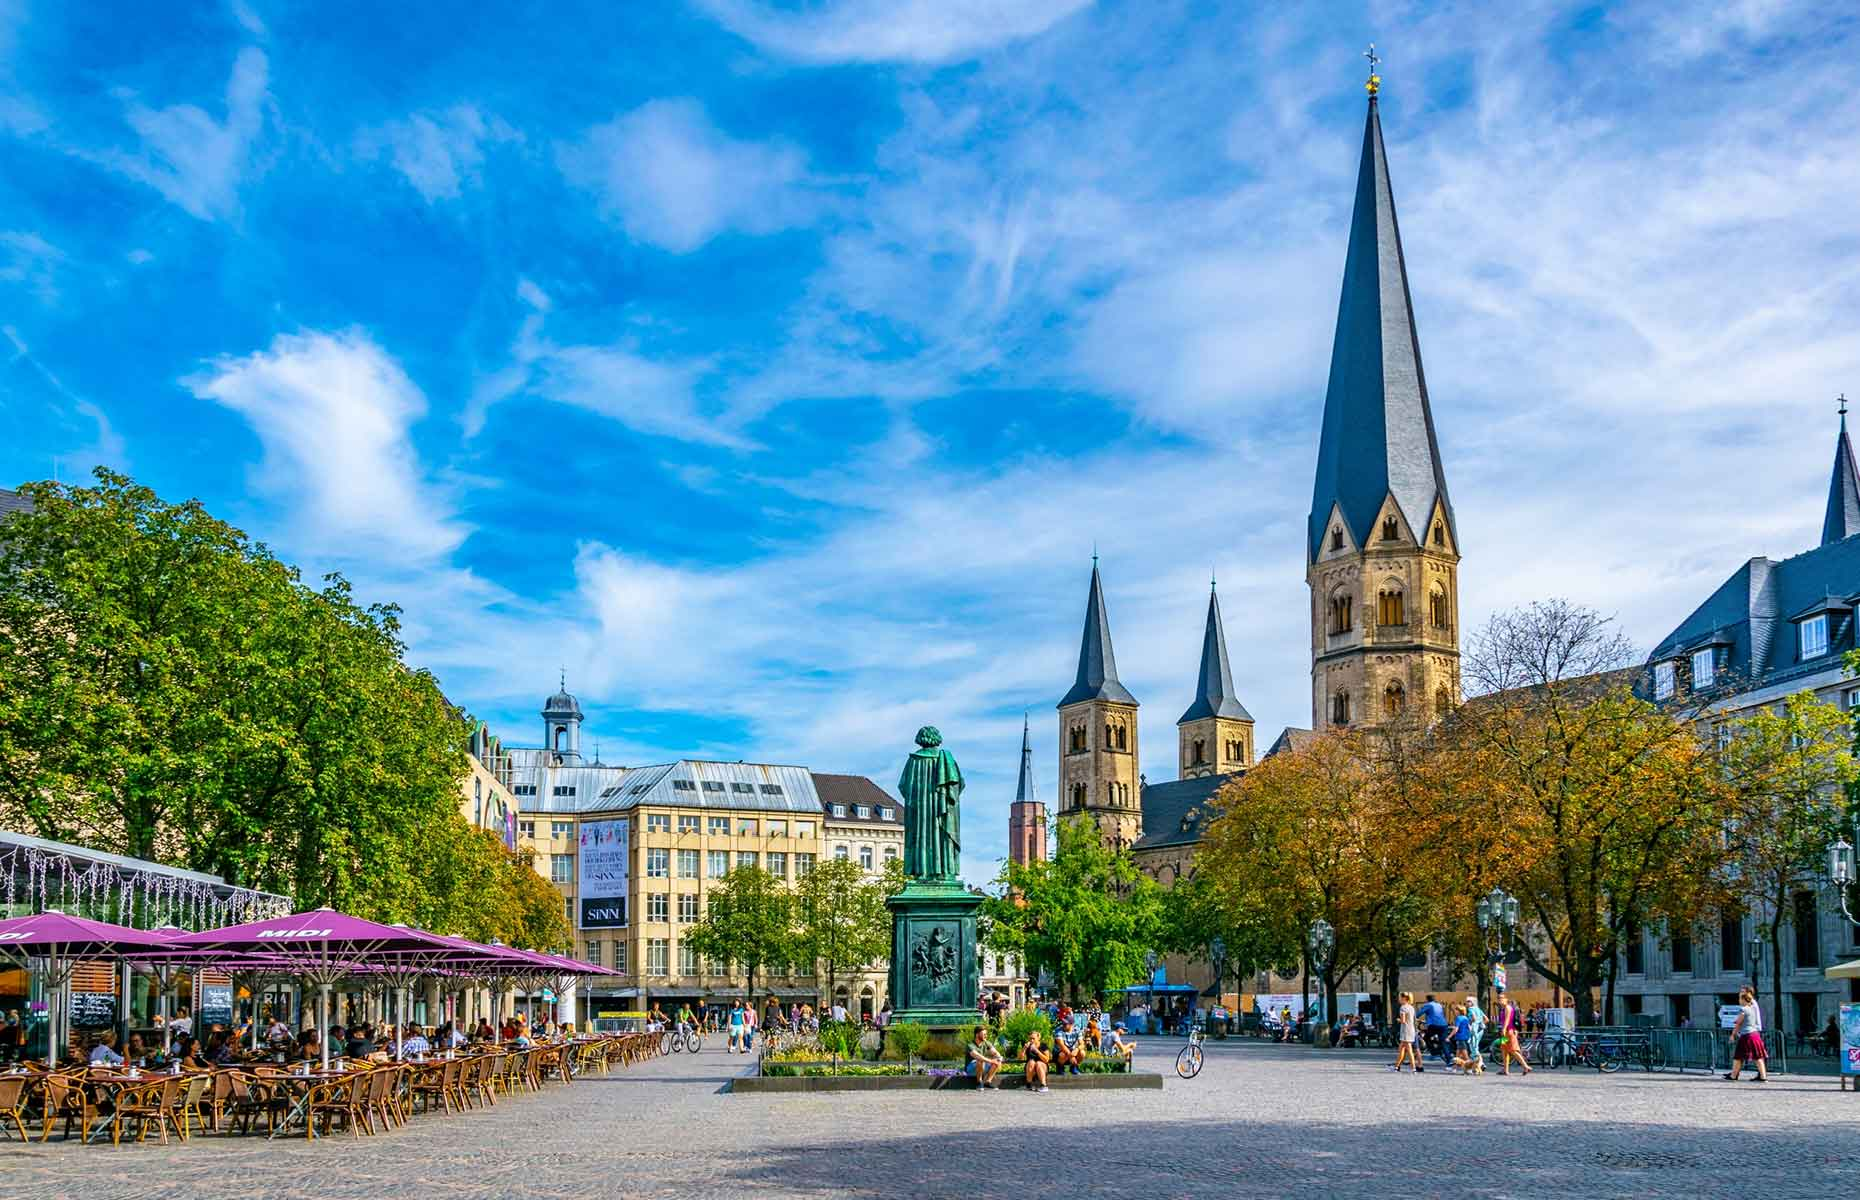 Munsterplatz in Bonn, Germany (Image: trabantos/Shutterstock)